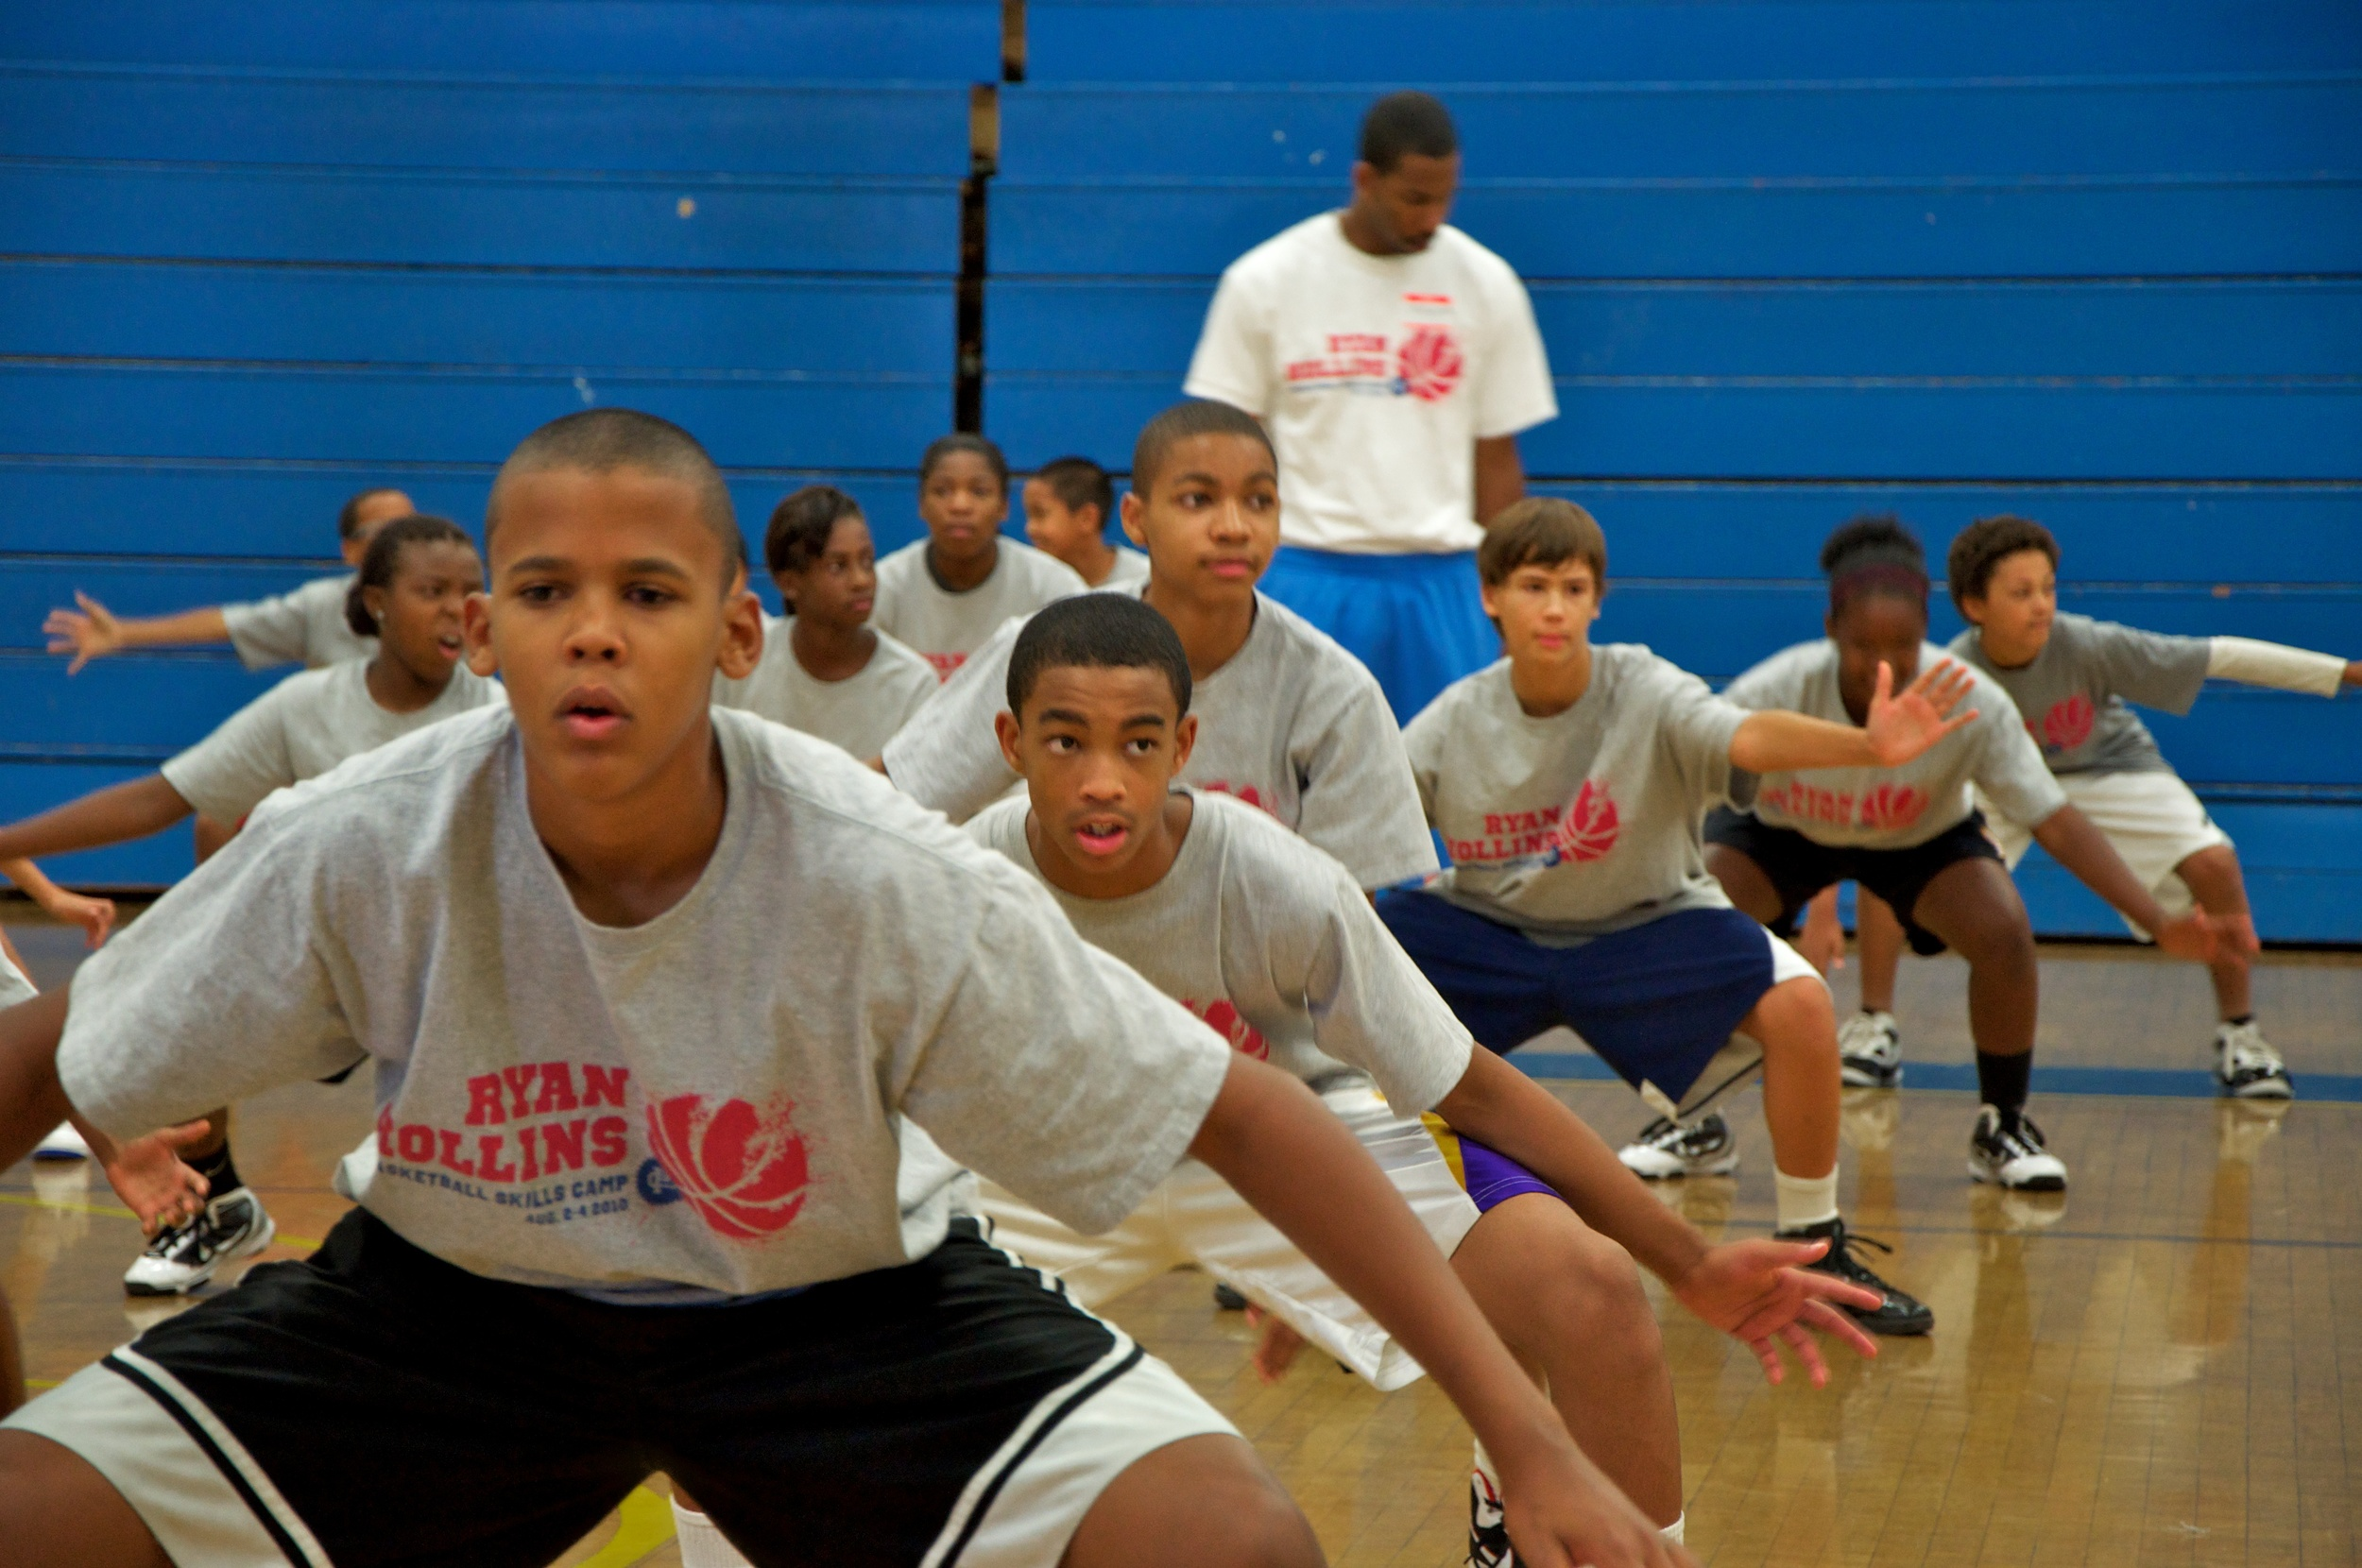 Ryan Hollins Basketball Camp 19.jpg